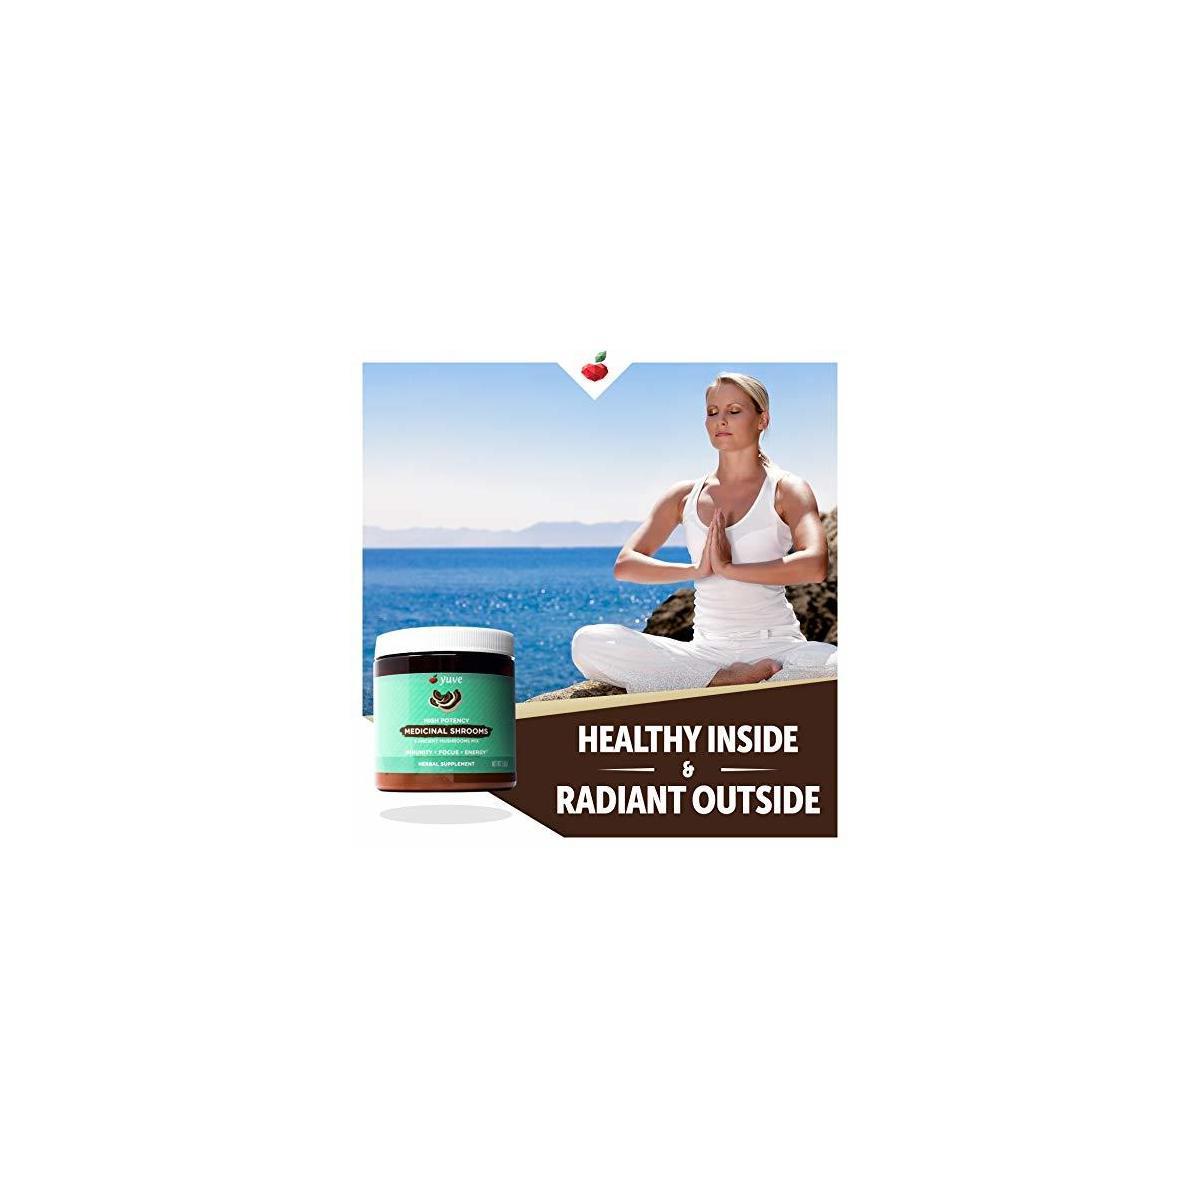 Yuve 6 Organic Mushroom Extract Powder - Magic Blend of Reishi, Chaga, Lions Maine, Turkey Tail, Maitake, Cordyceps - Add to Tea, Coffee, Smoothies - Energy Support & Immune Defense - 2.82oz